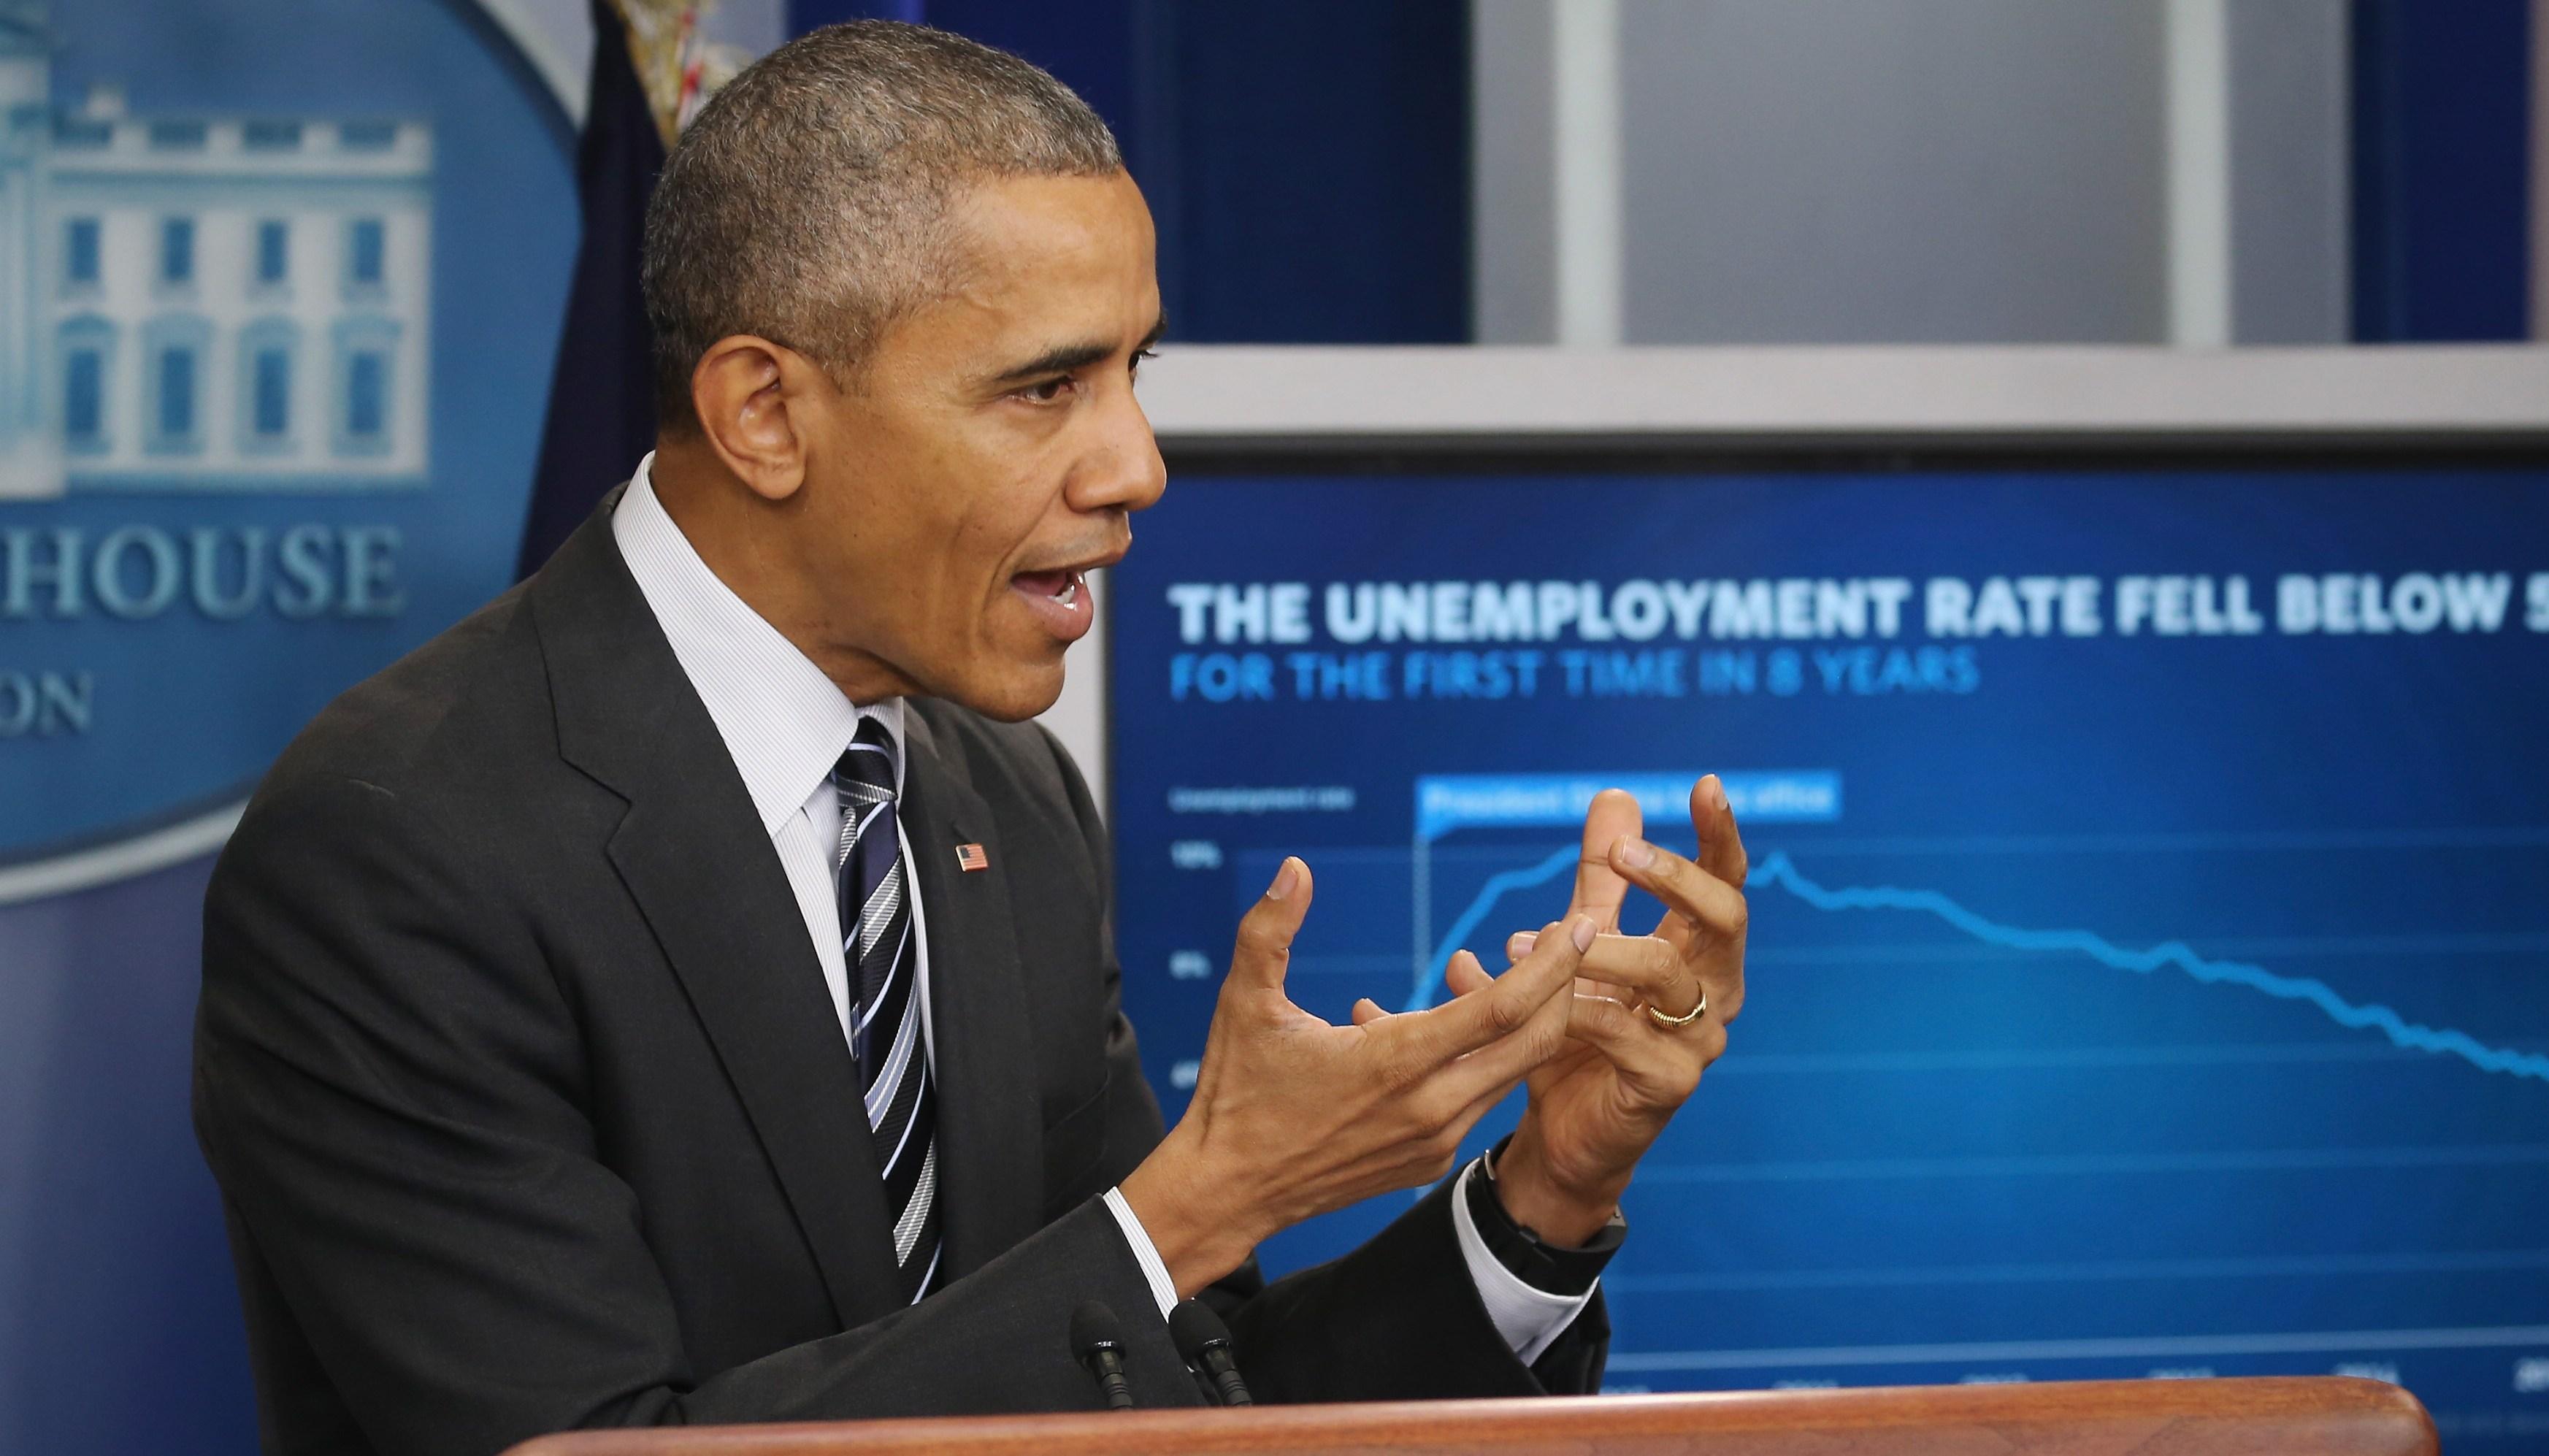 President Obama Speaks On The Economy In Brady Press Briefing Room